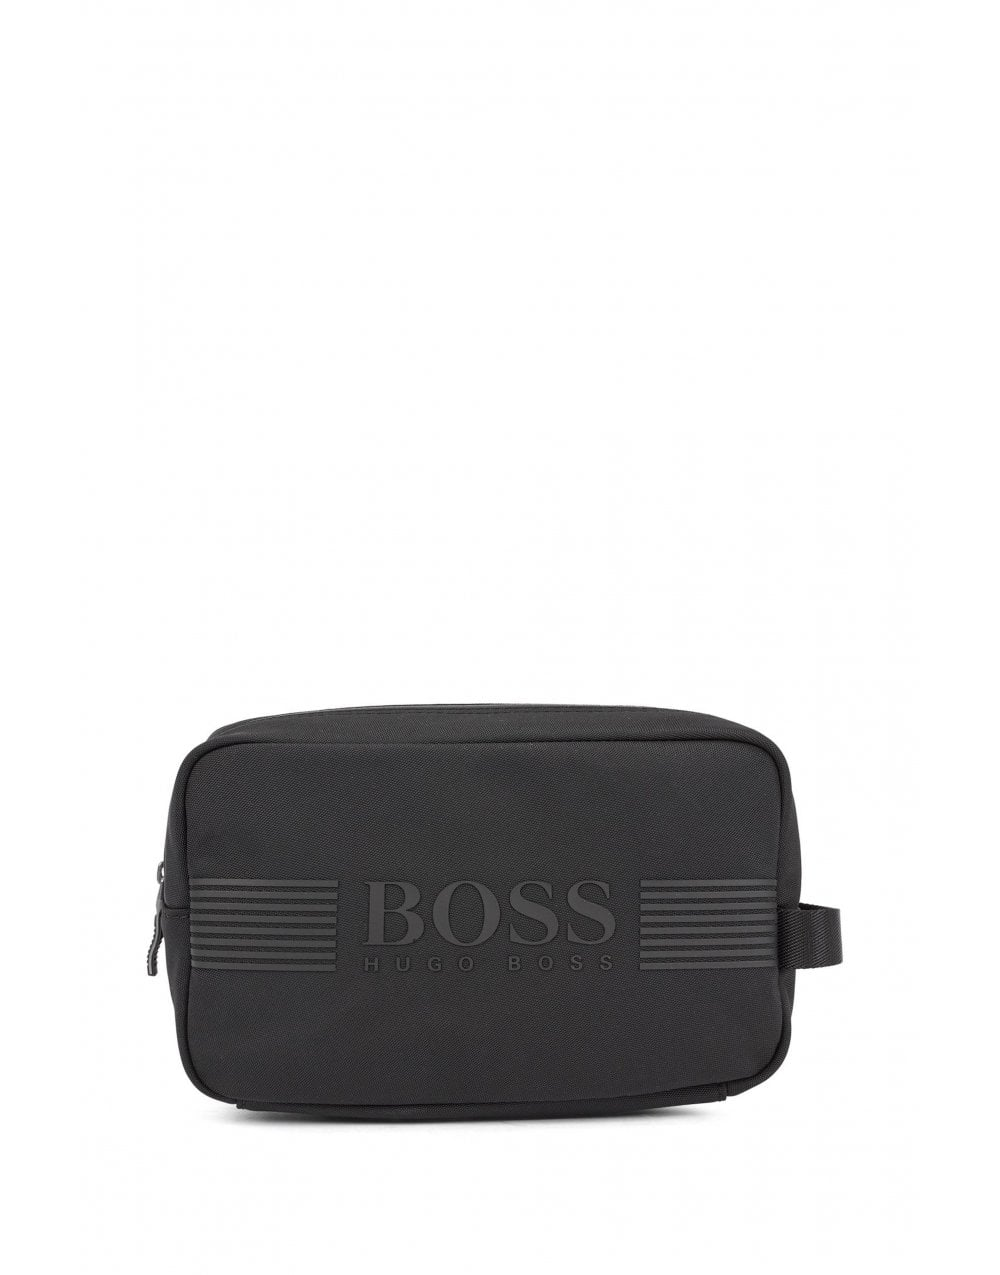 Hugo Boss Bags Pixel/_Washbag Wash Bag Men Black Brand New